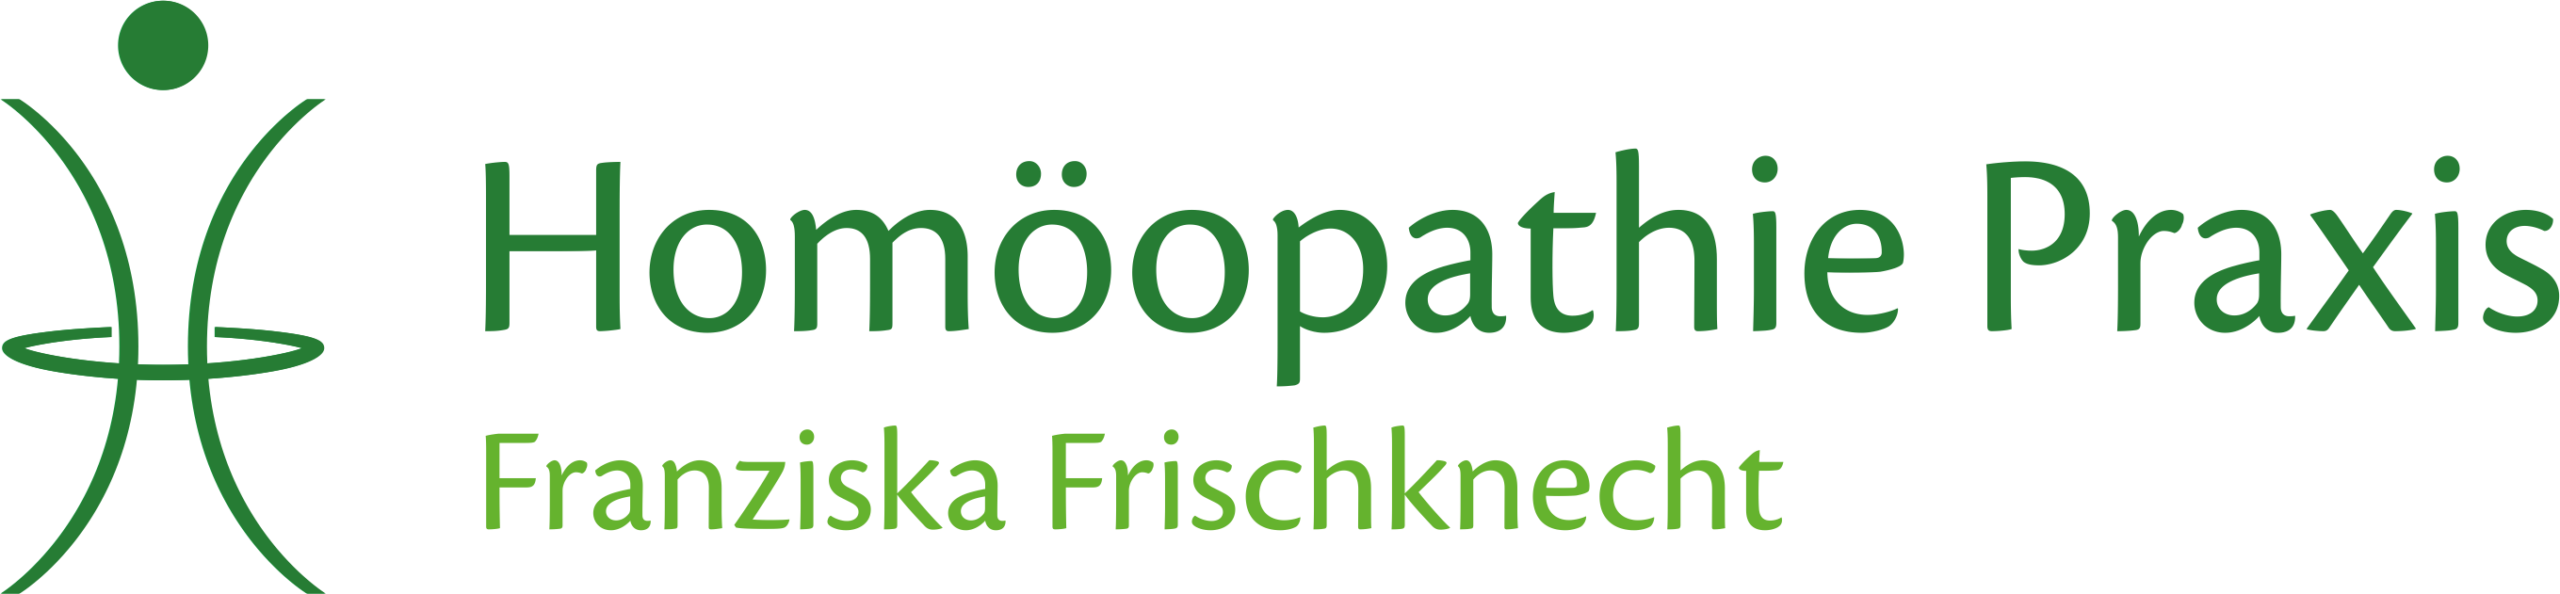 LogoFranziska-scaled